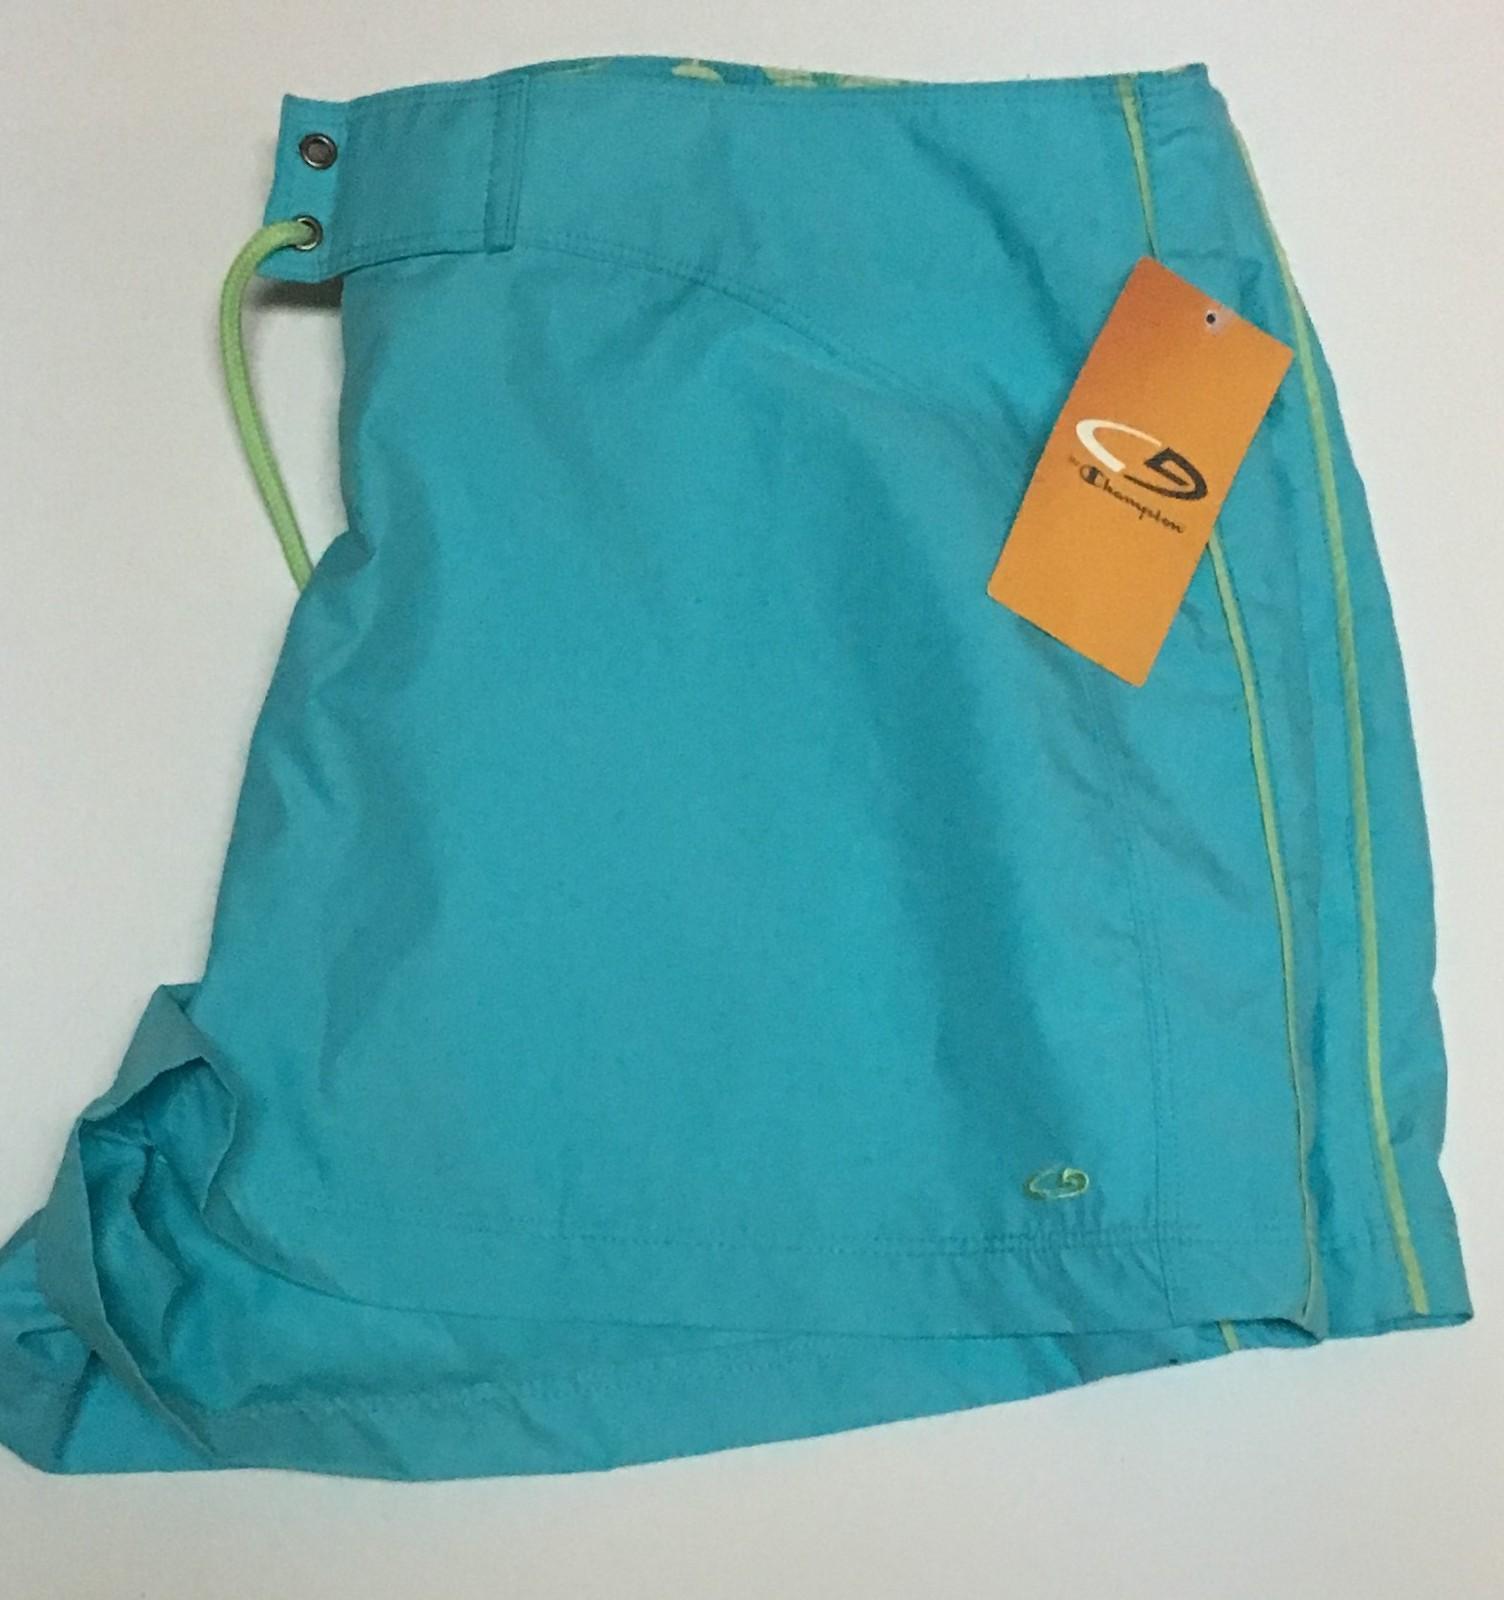 Champion Activewear Shorts Colorwave Aqua Sz XL Velcro Drawstring image 4